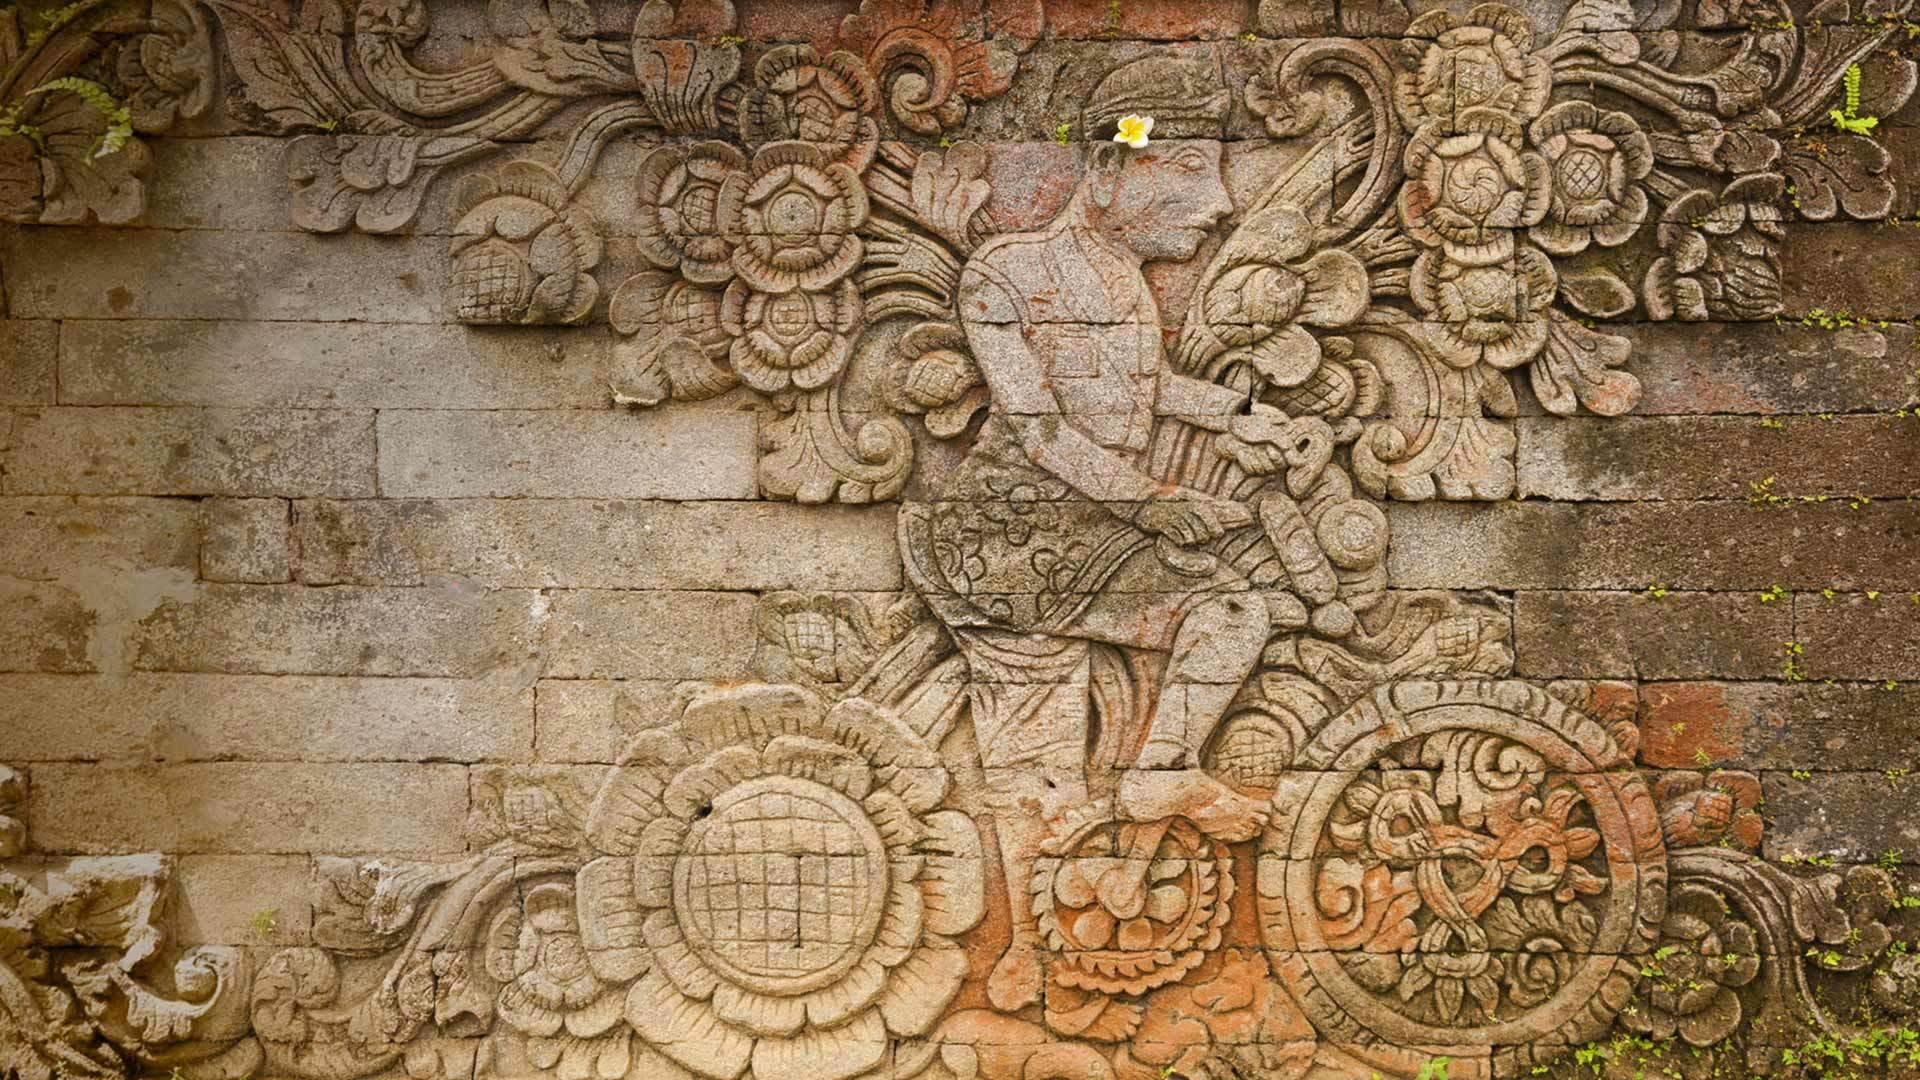 the Pura Meduwe Karang神庙中雕刻艺术家W.O.J.Nieuwenkamp的作品